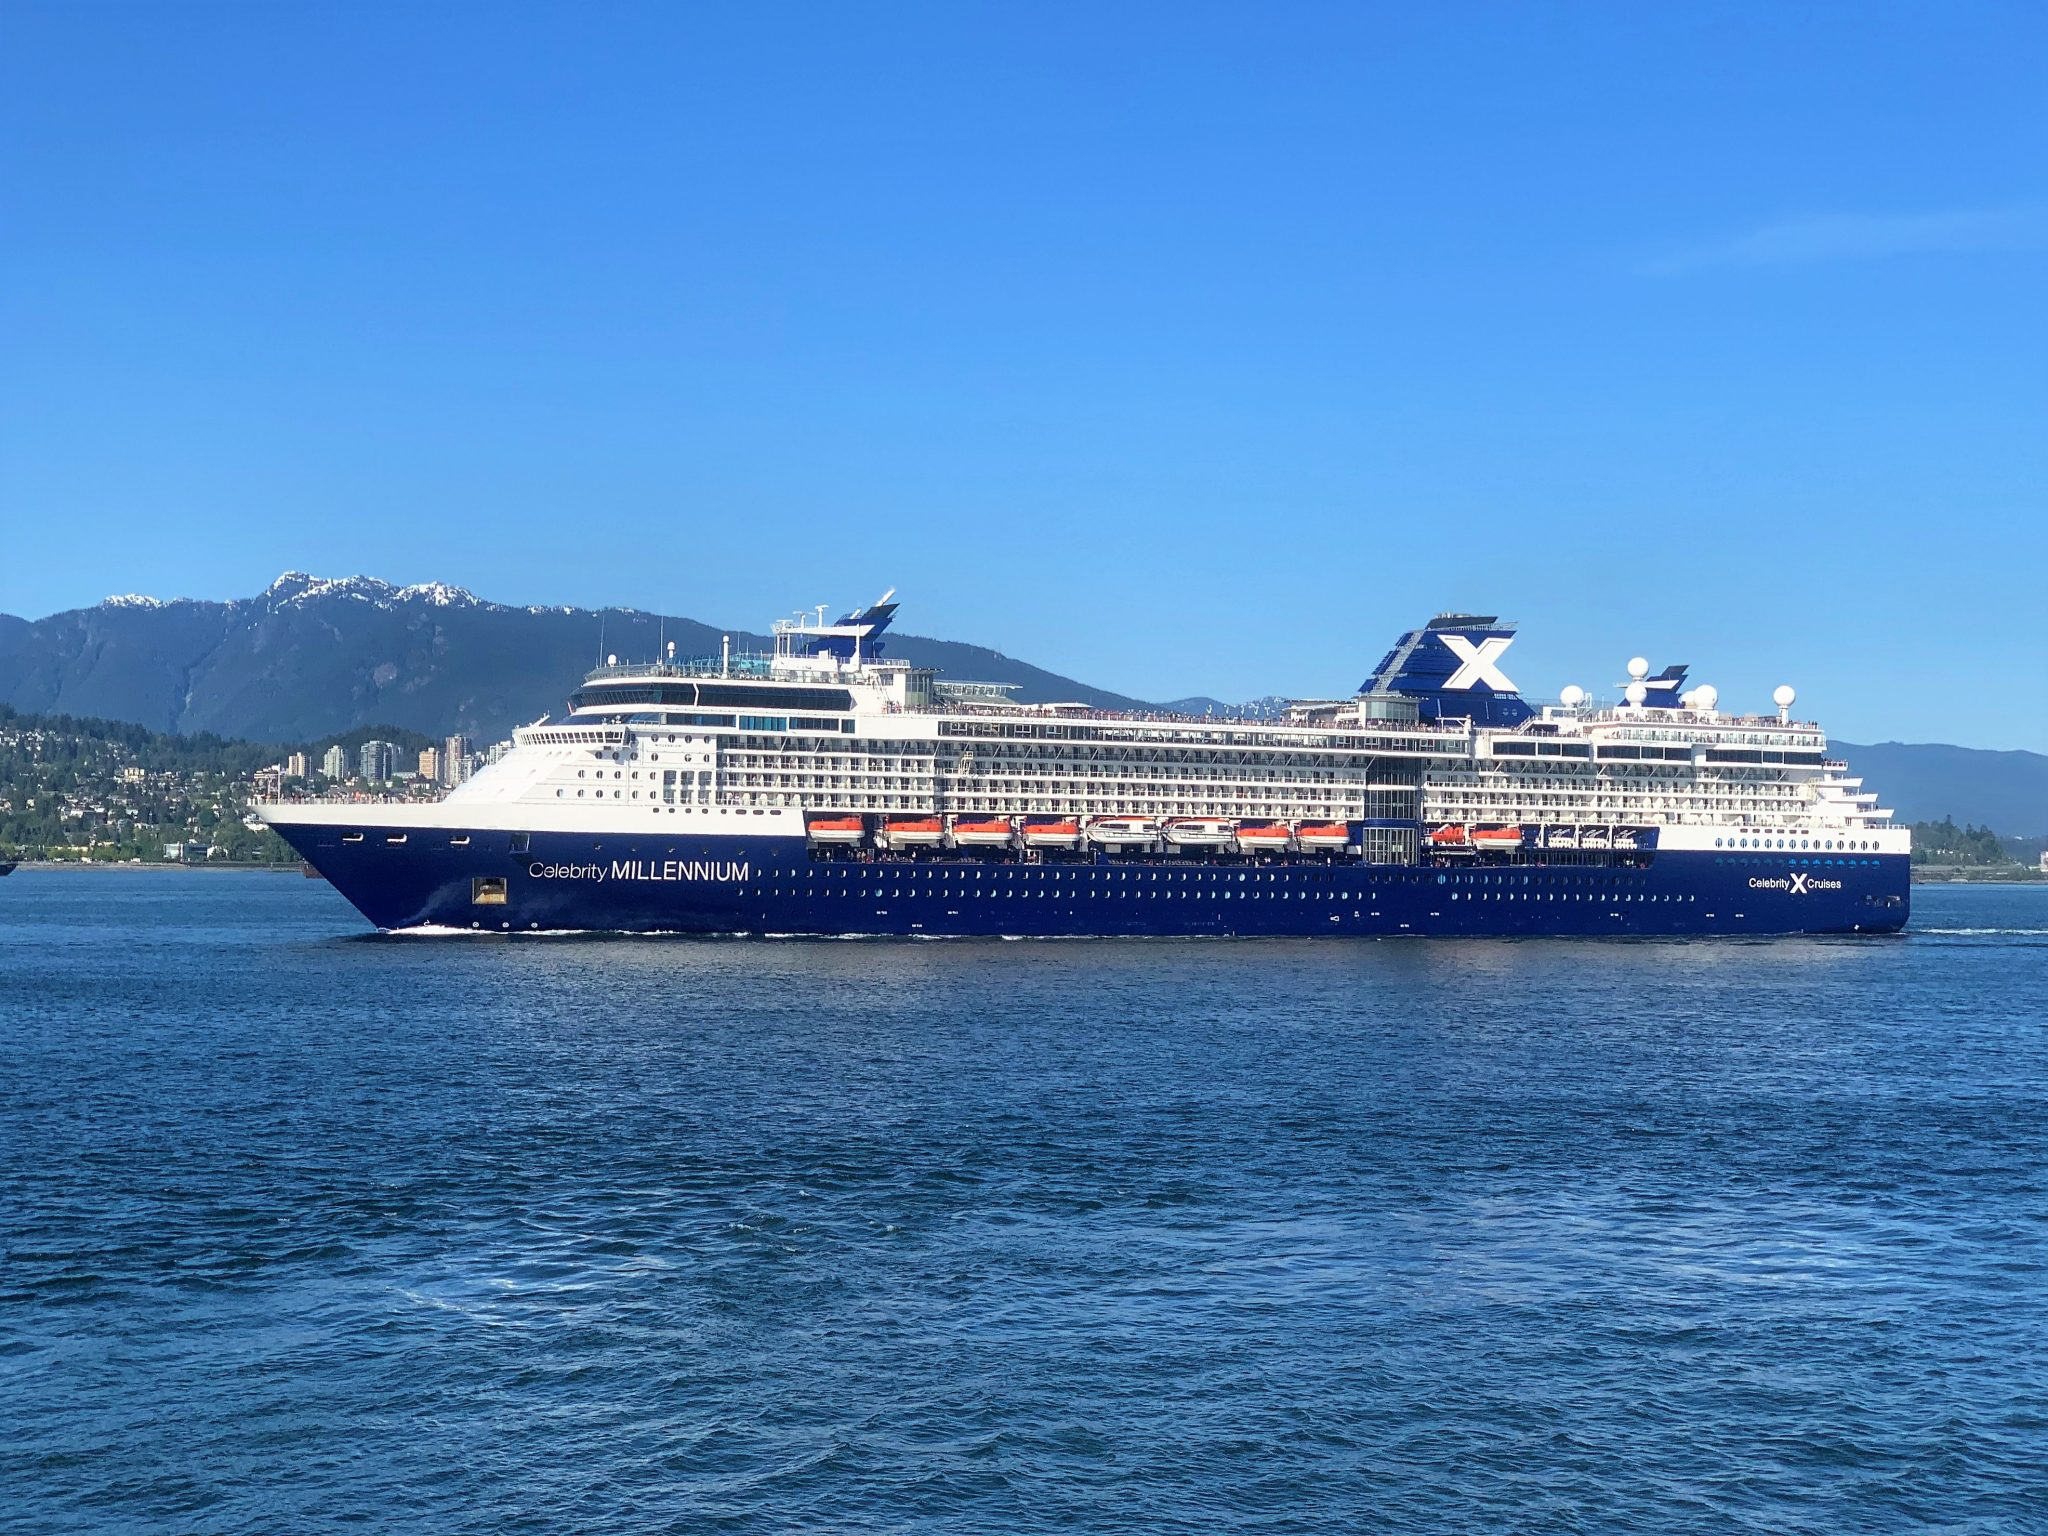 Alaska Cruise 2020.Our Picks For Top Alaska Cruises In 2020 Eatsleepcruise Com